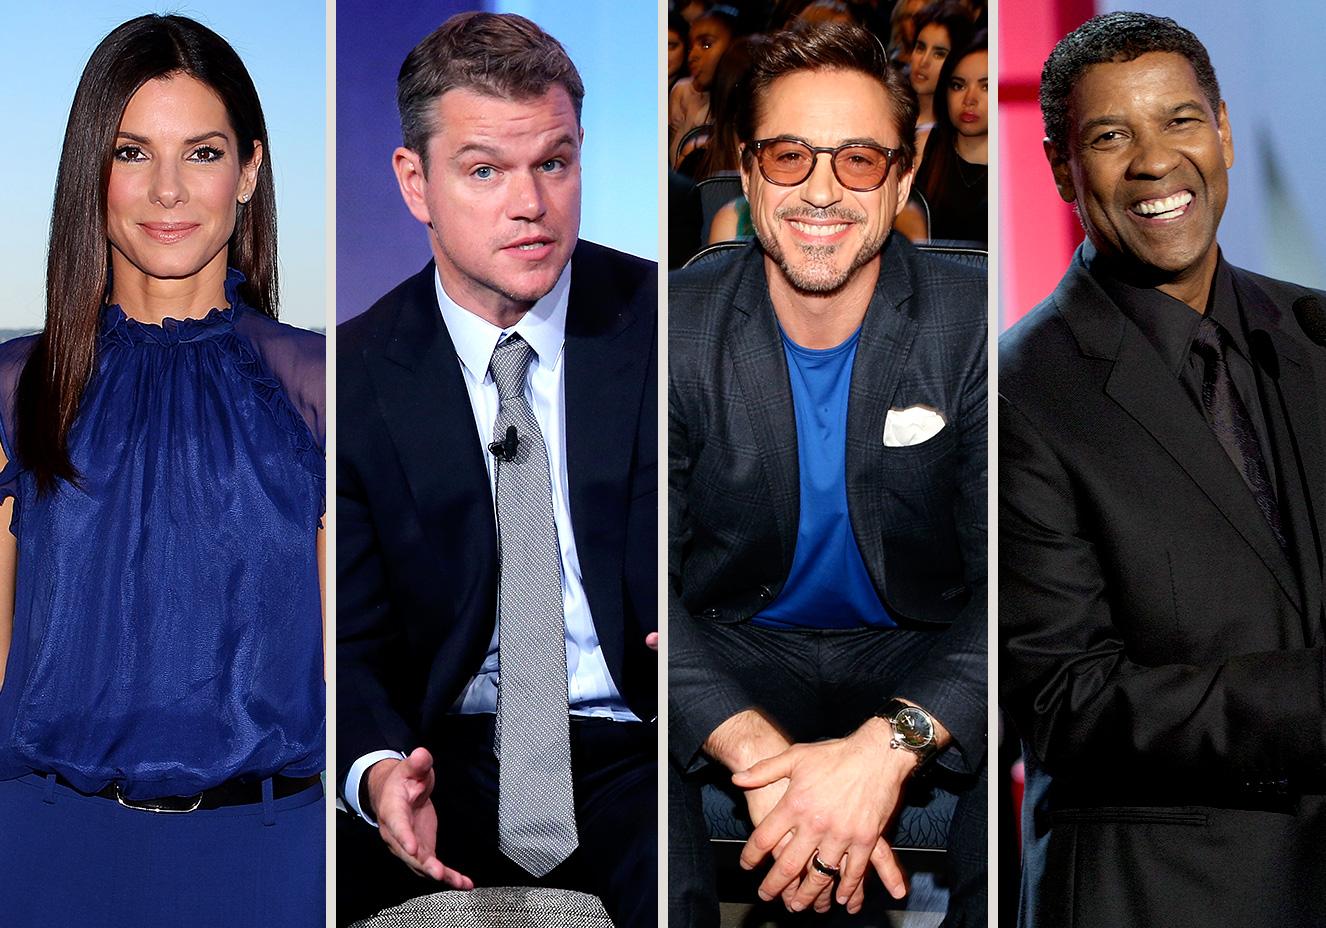 Lisa Maree Williams/Jemal Countess/Christopher Polk/Carlos Alvarez/Getty Images